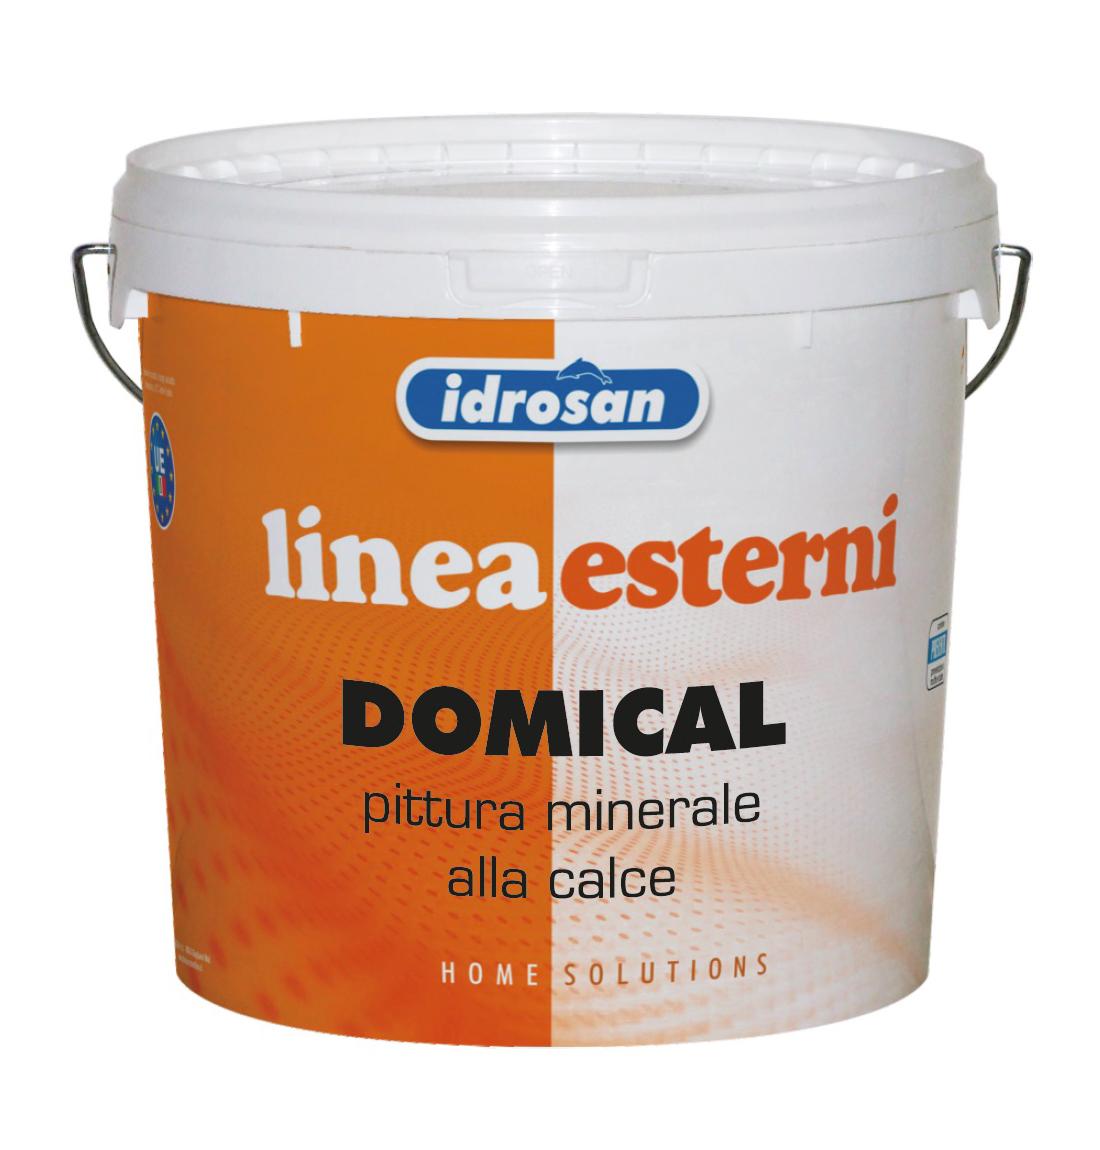 DOMICAL